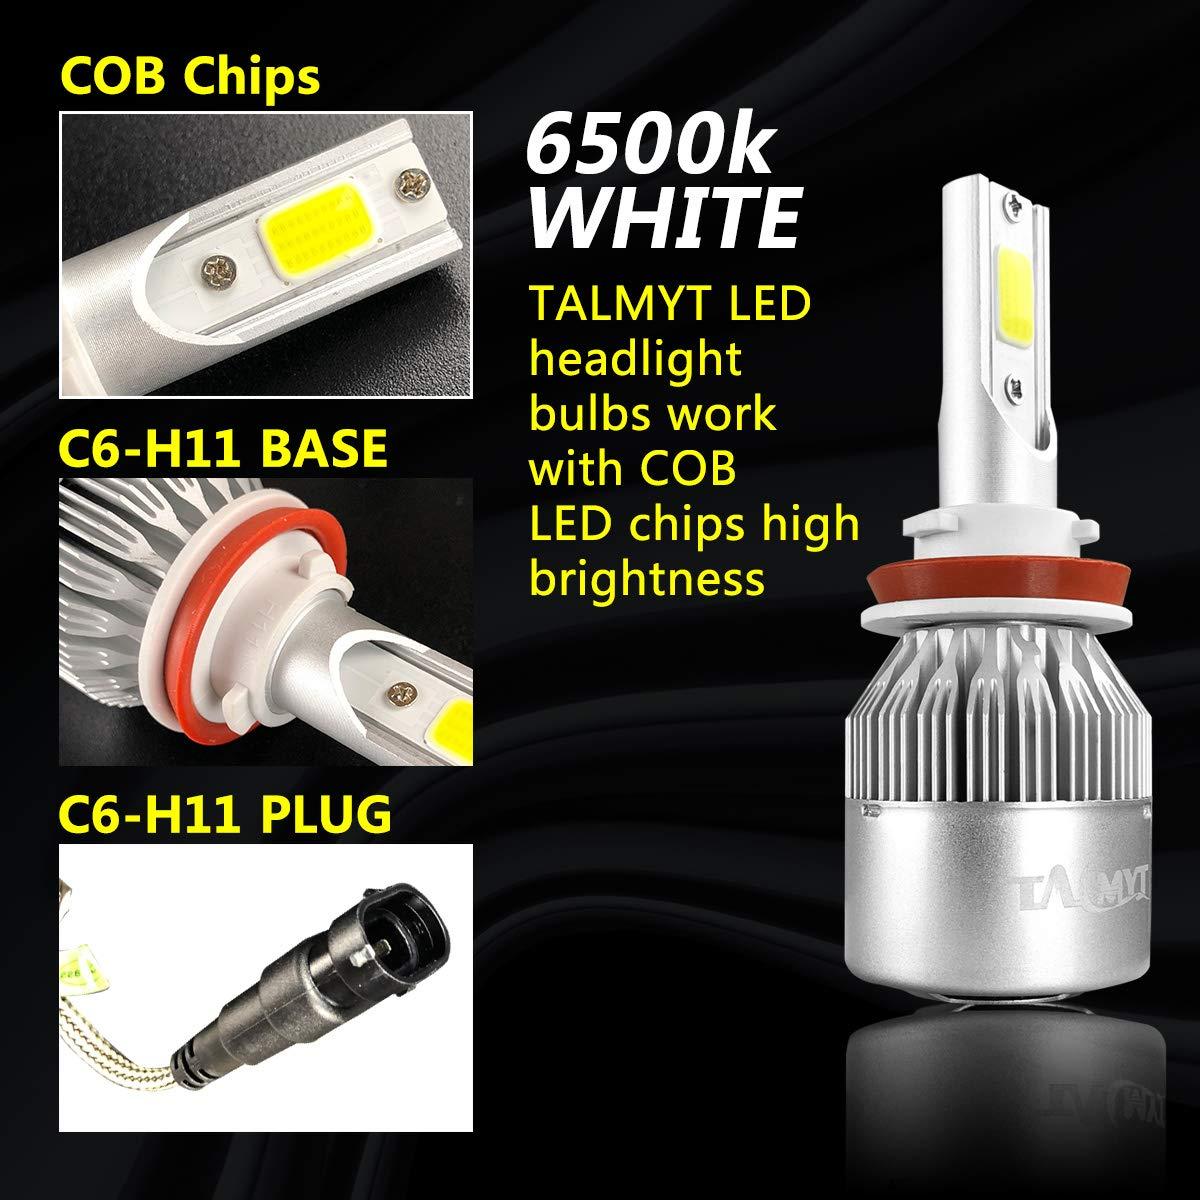 H9 LED Faros Kit LED bombillas para faros delanteros COB Chip 36 W//Bombilla 3800LM 12 V reemplazar para luces hal/ógenas o HID Bombillas